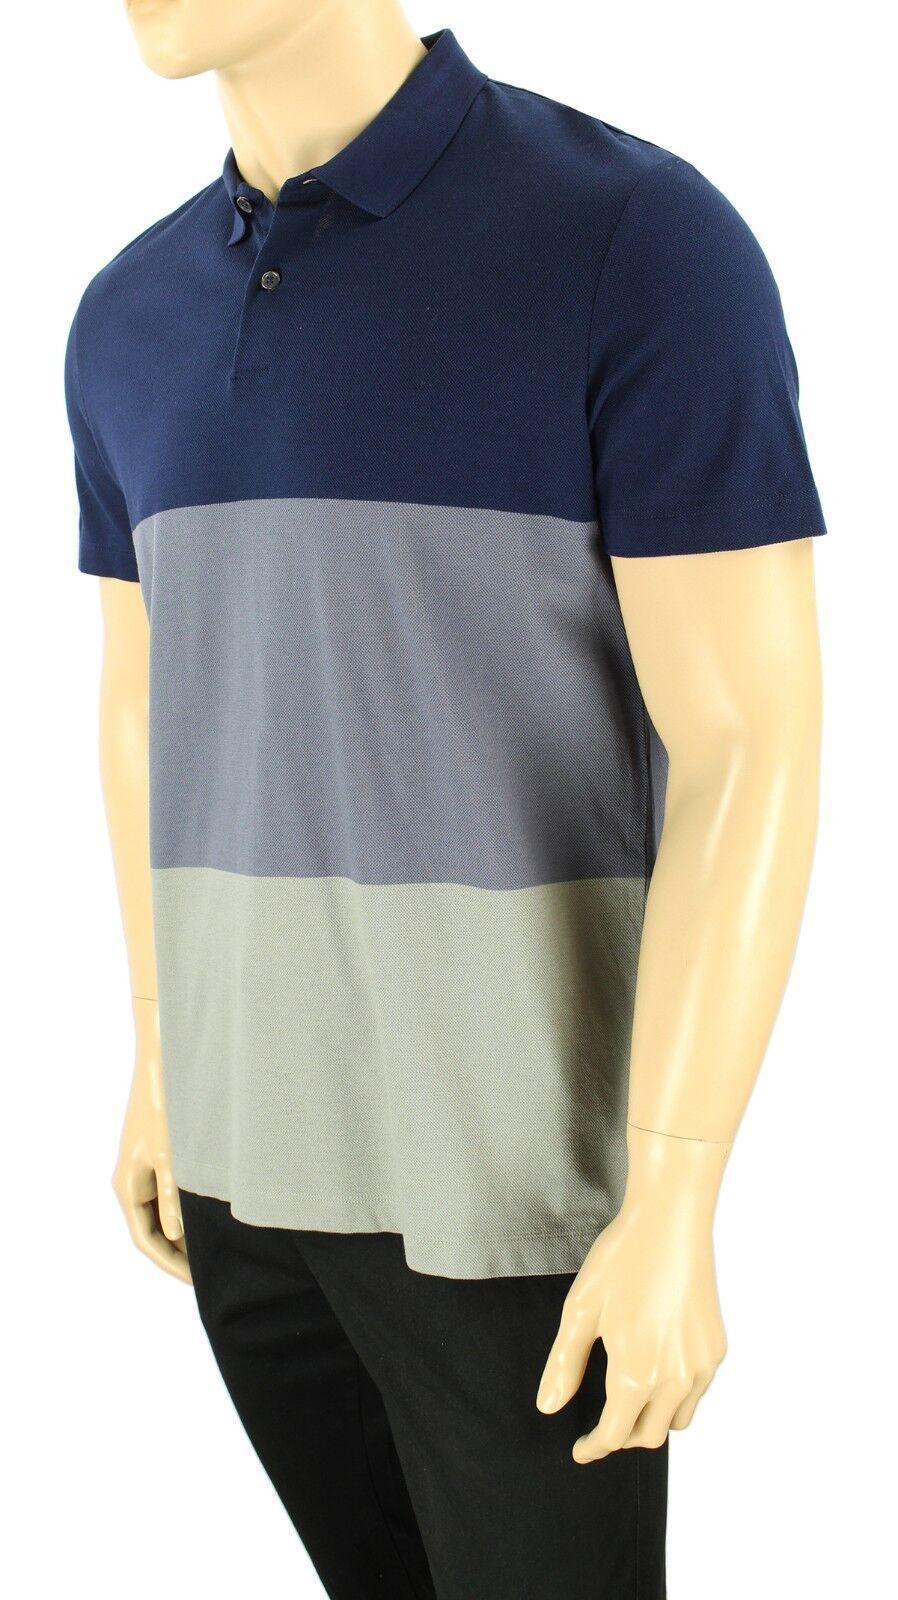 Polo Ralph Lauren Uomo button down dress fit shirt estate classic fit dress 18 new xxl 2xl f10558